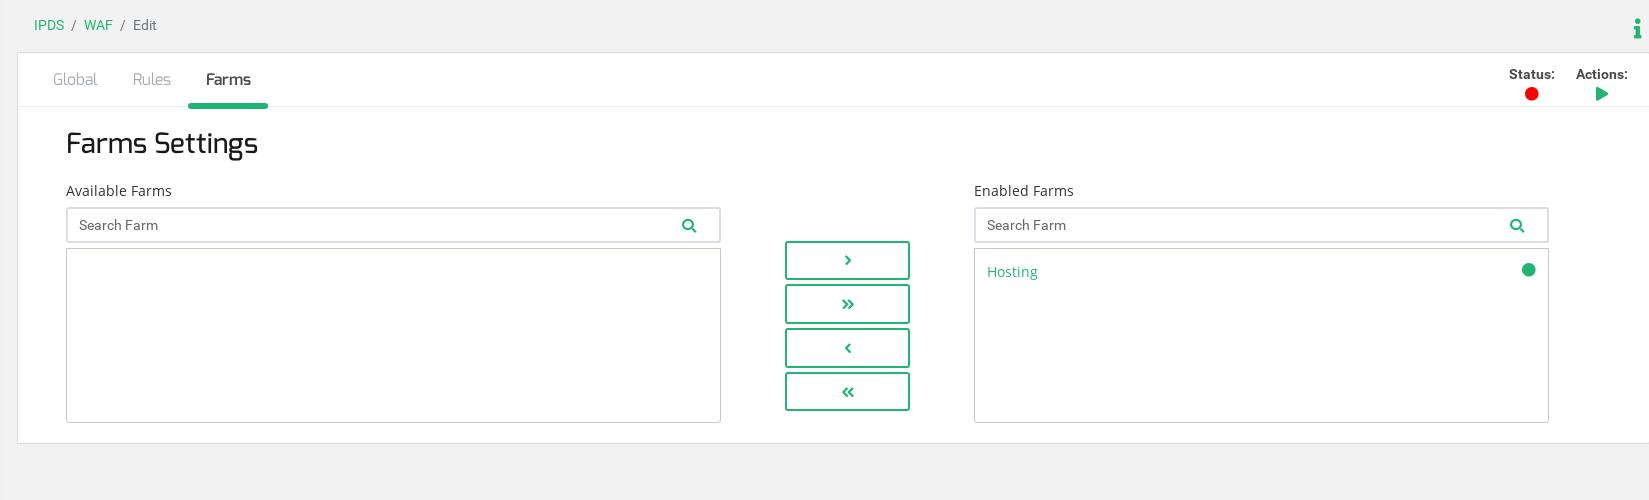 Zevenet IPDS WAF - Farm assignement